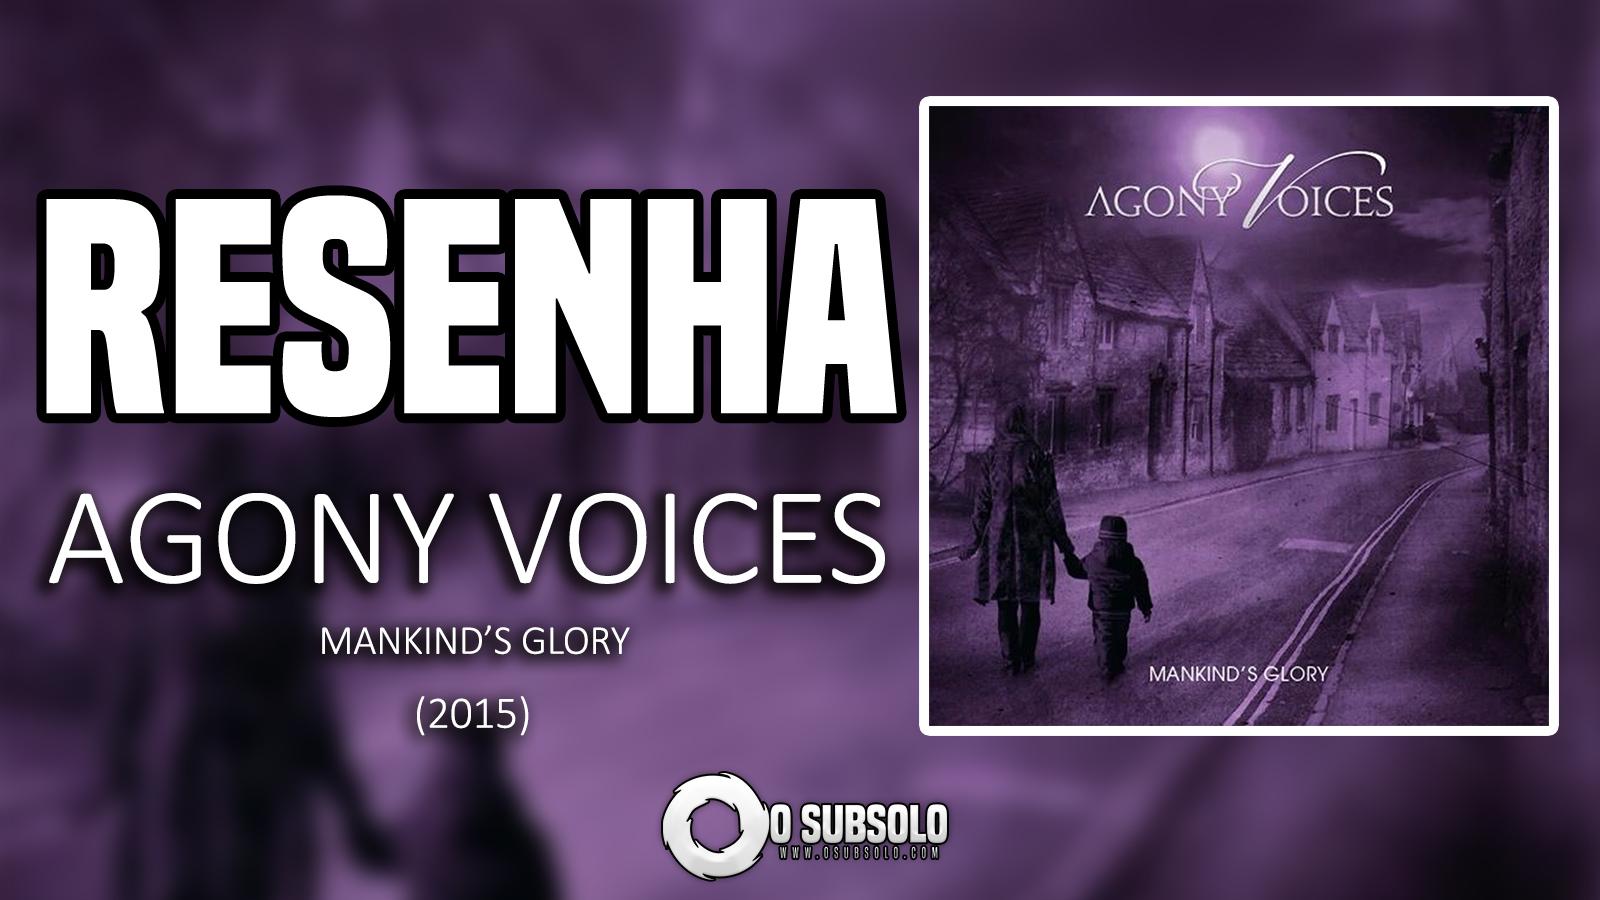 RESENHA   AGONY VOICES - MANKIND'S GLORY   O SUBSOLO